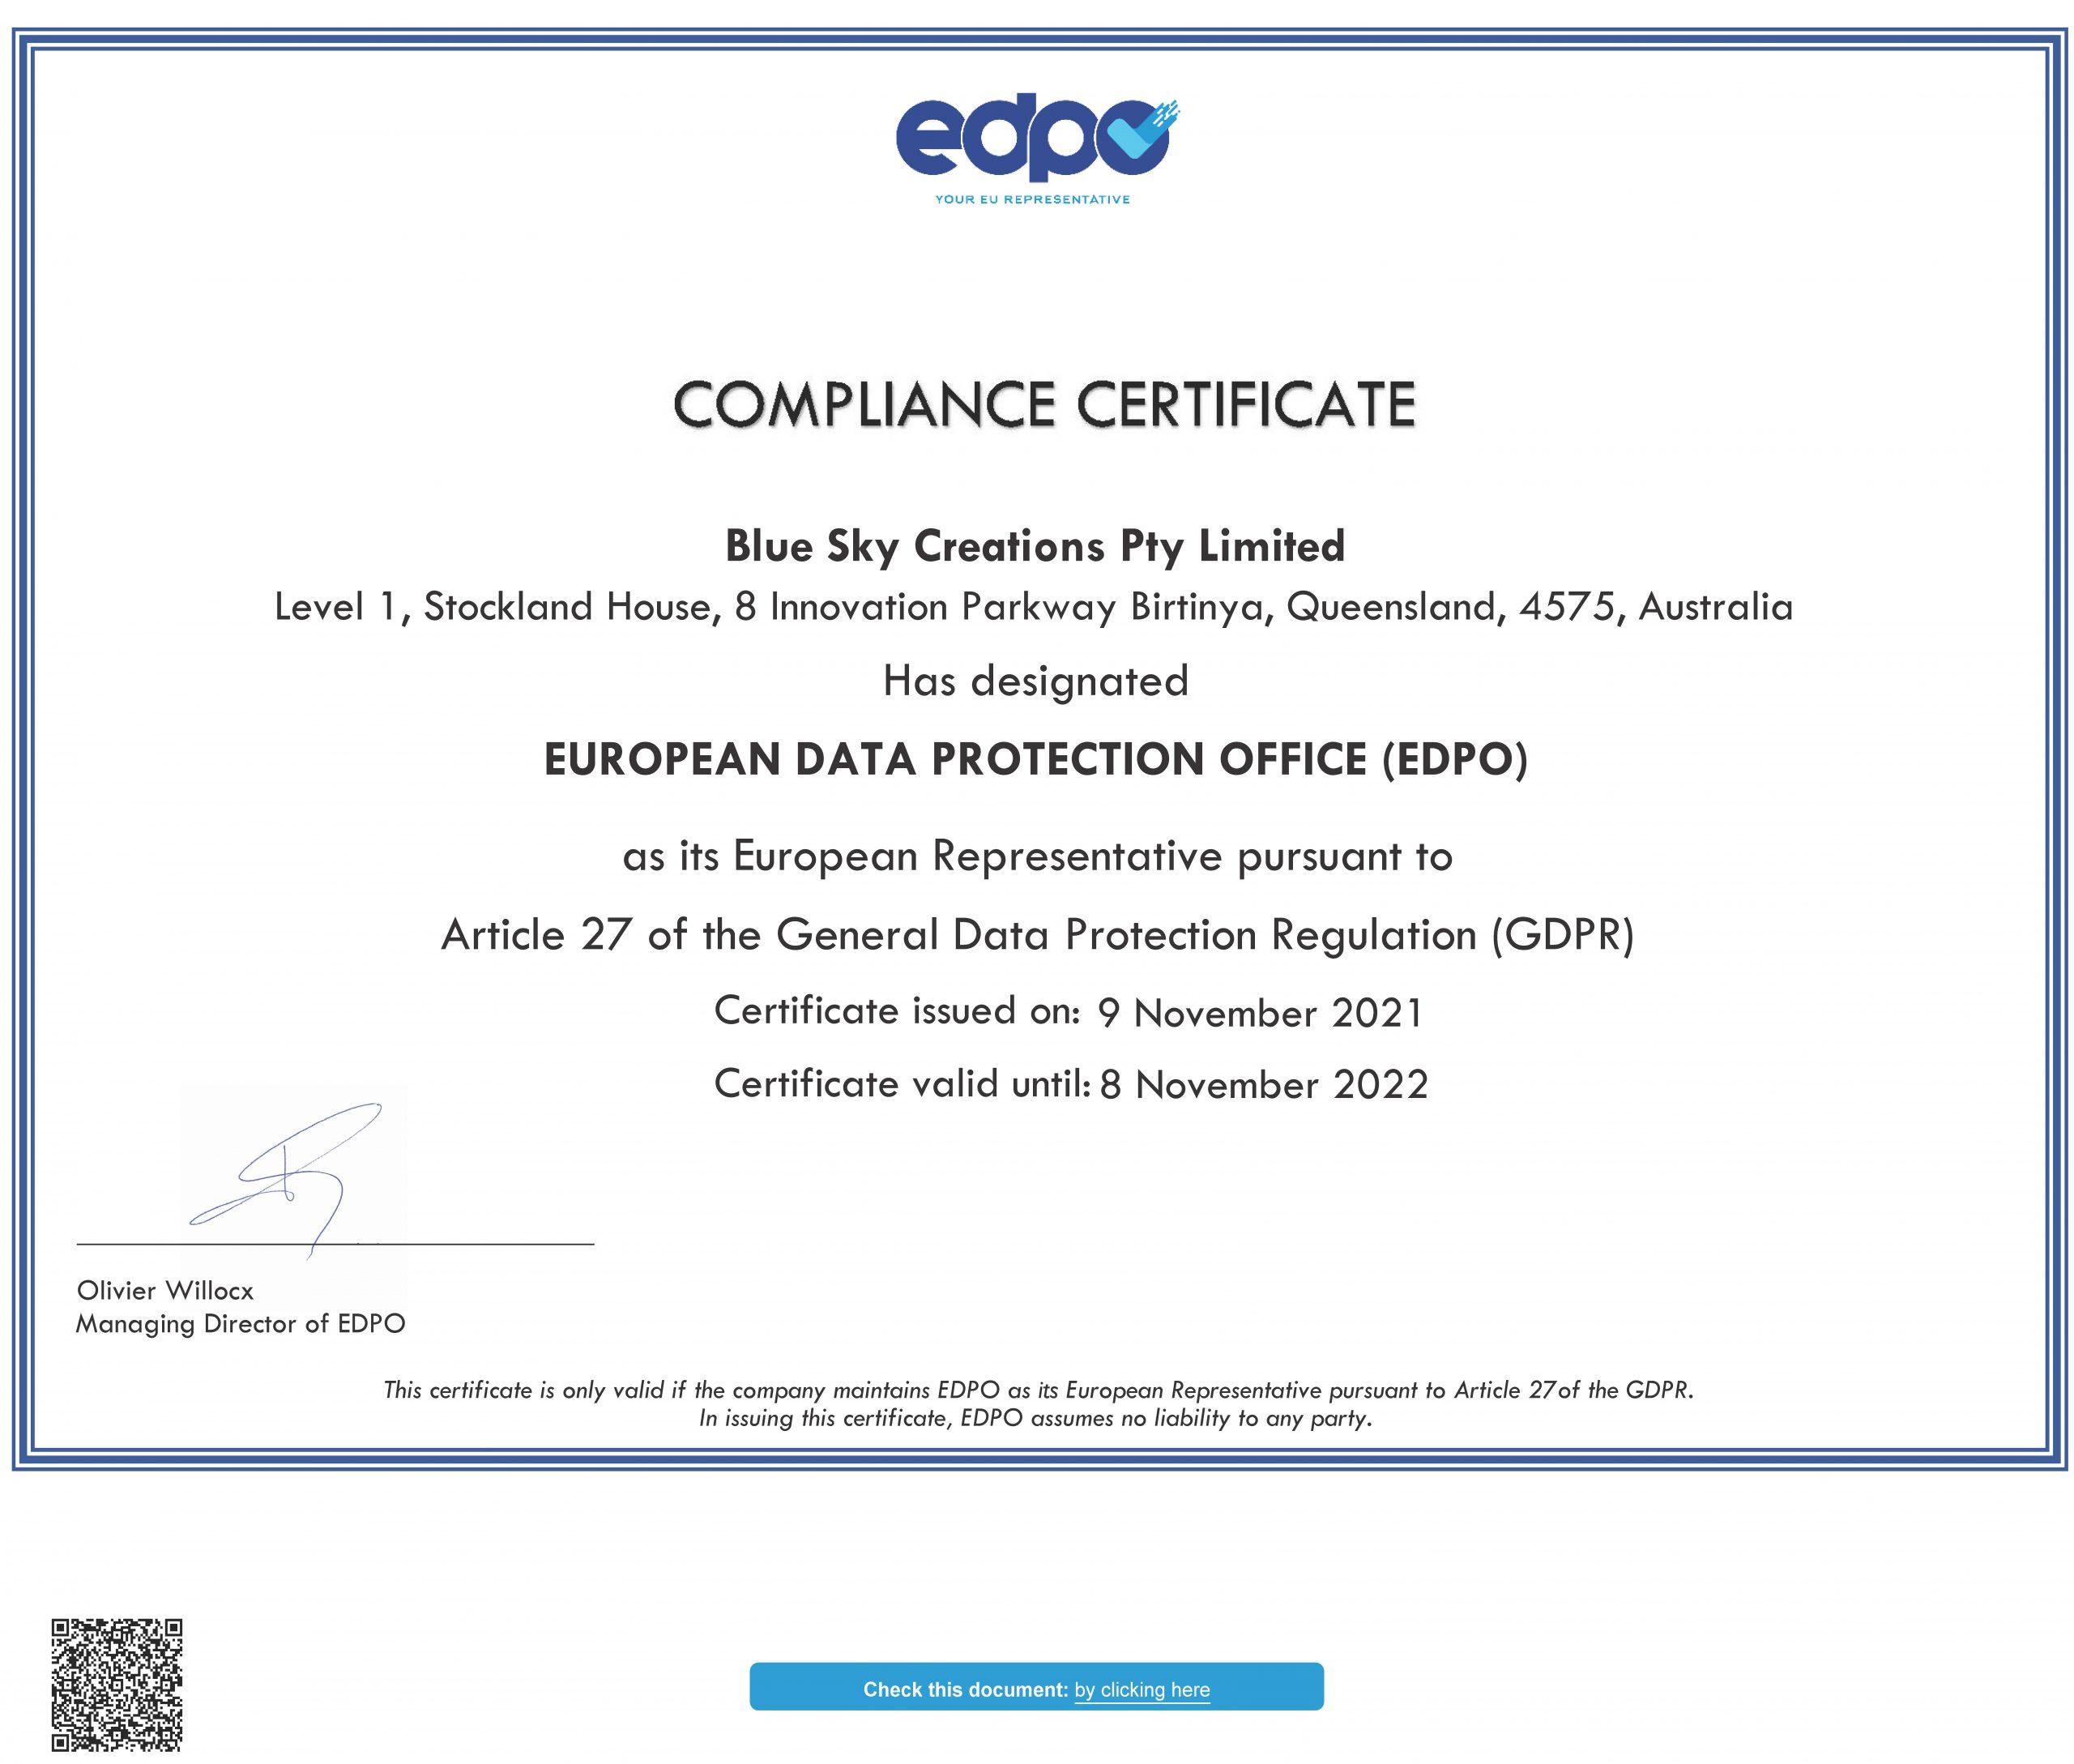 blue_sky_creations_pty_limited_compliance_eu_representative_compliance_certificate